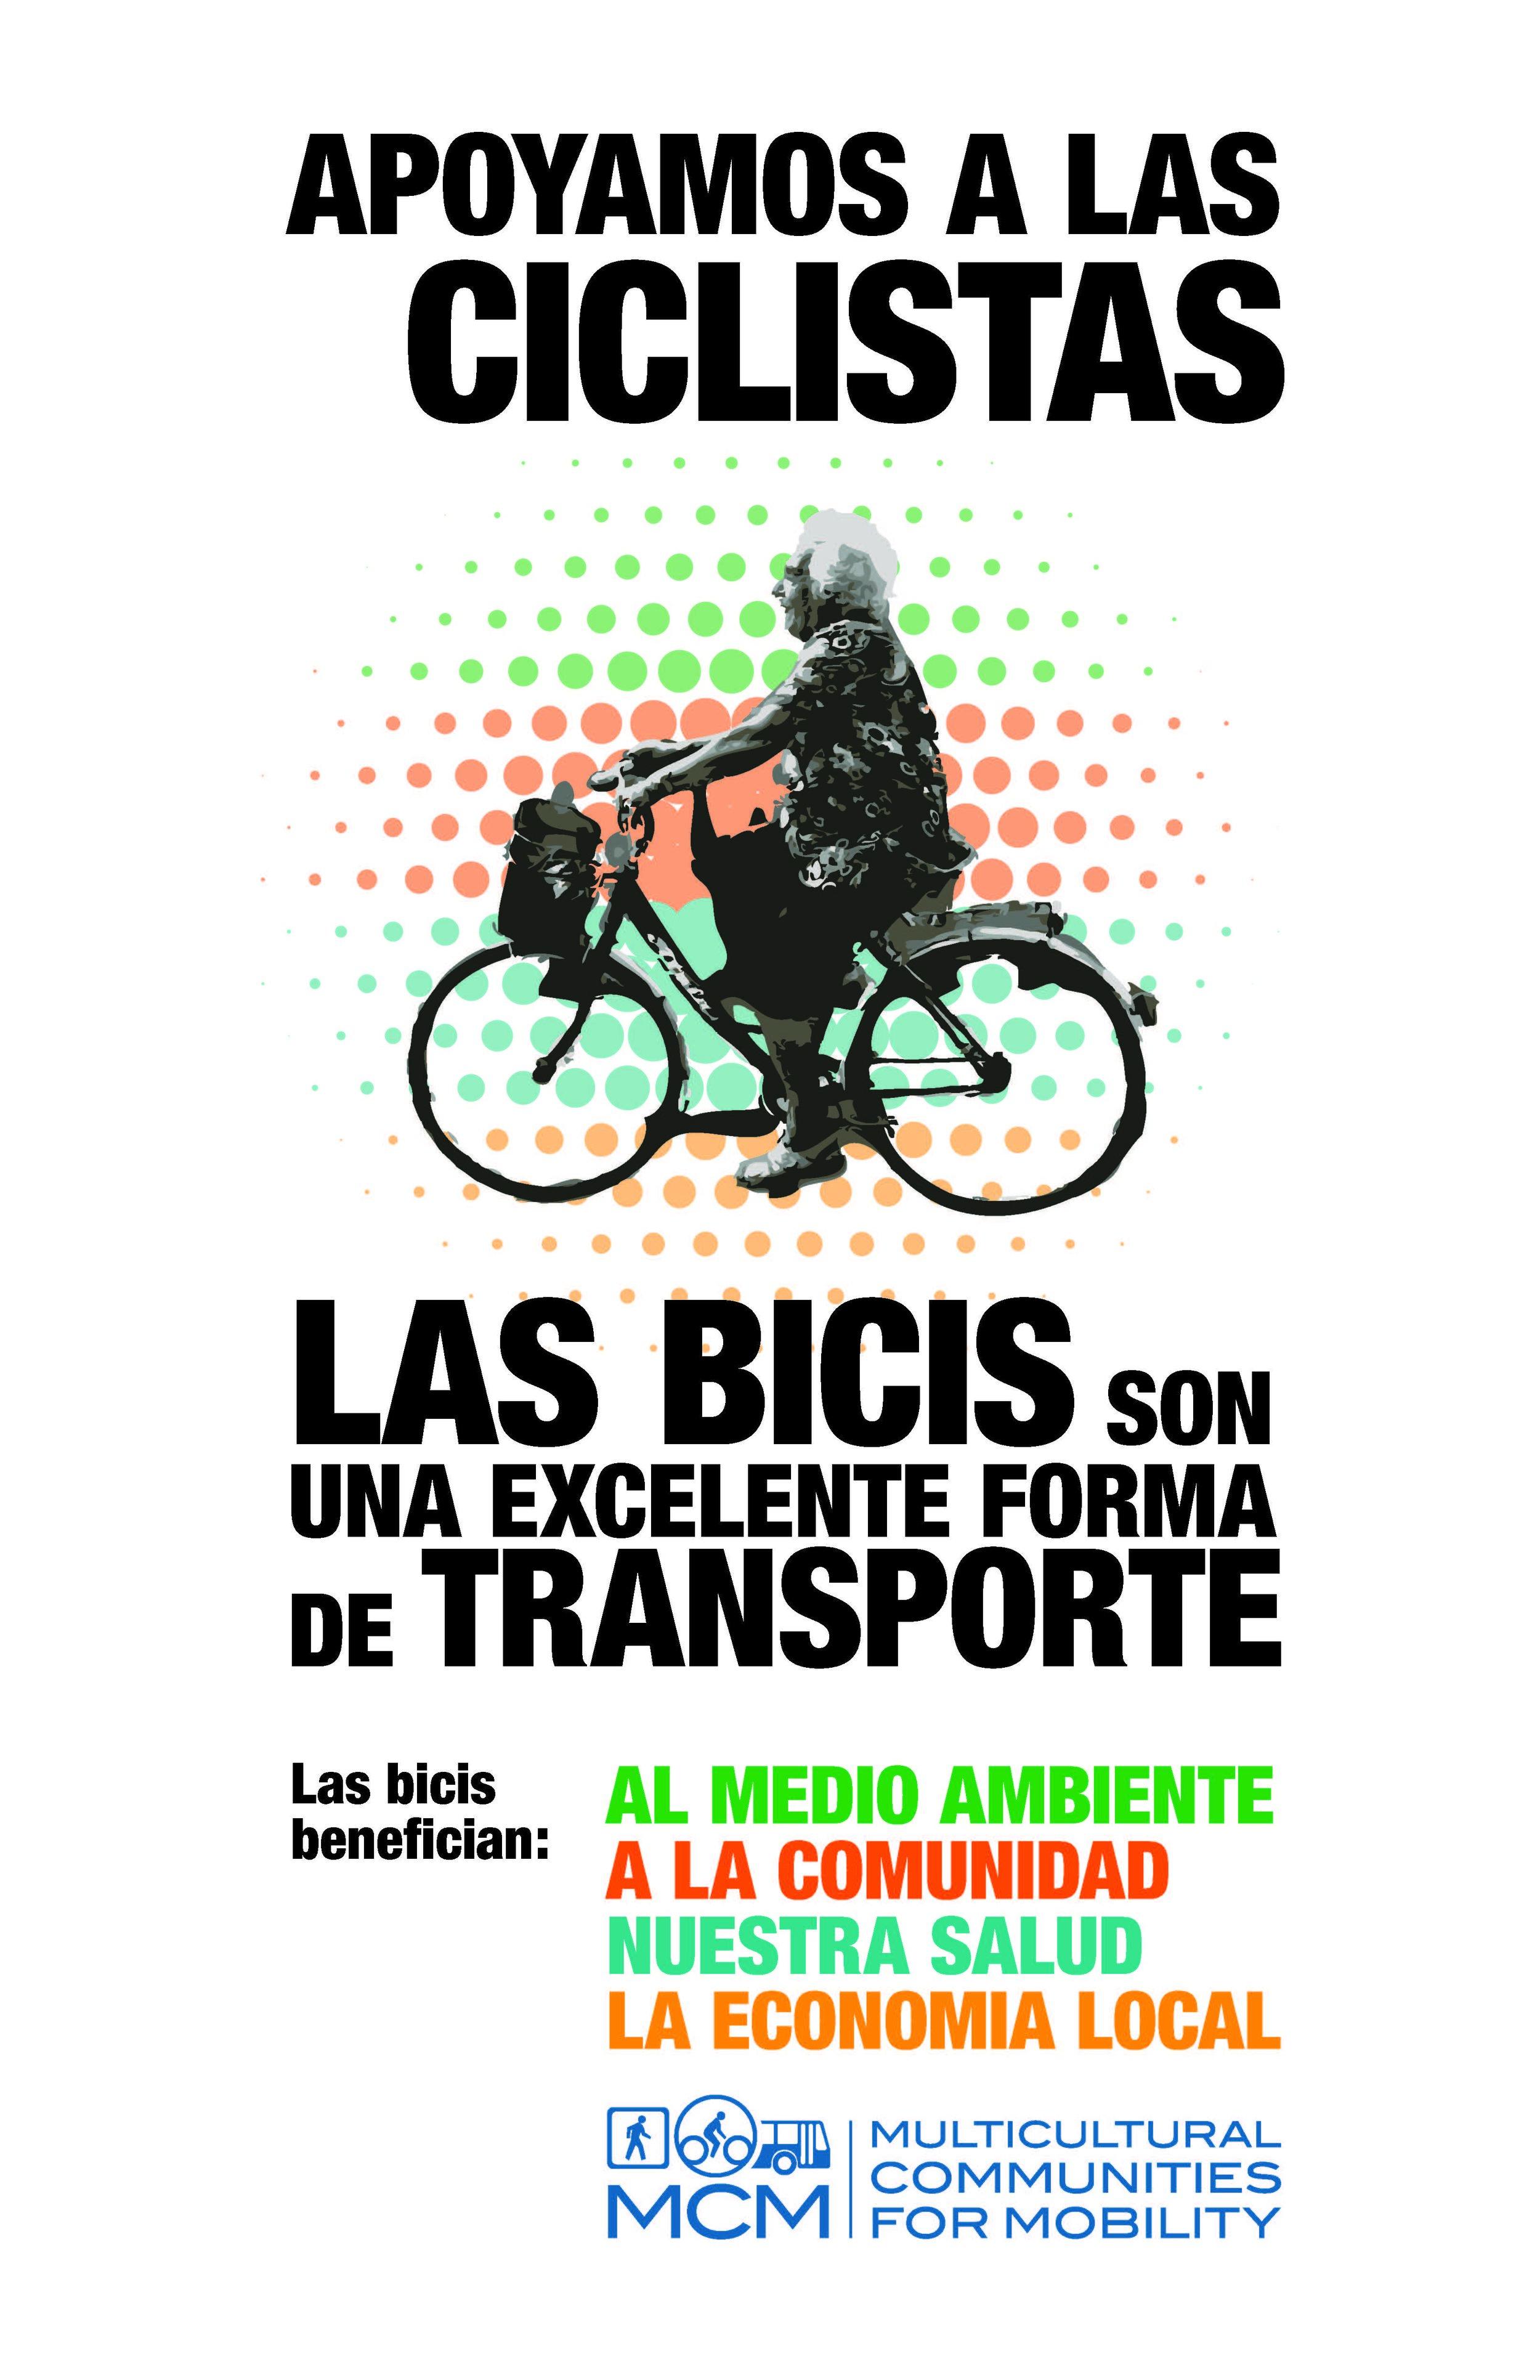 MCM BH promotores poster 1.jpg